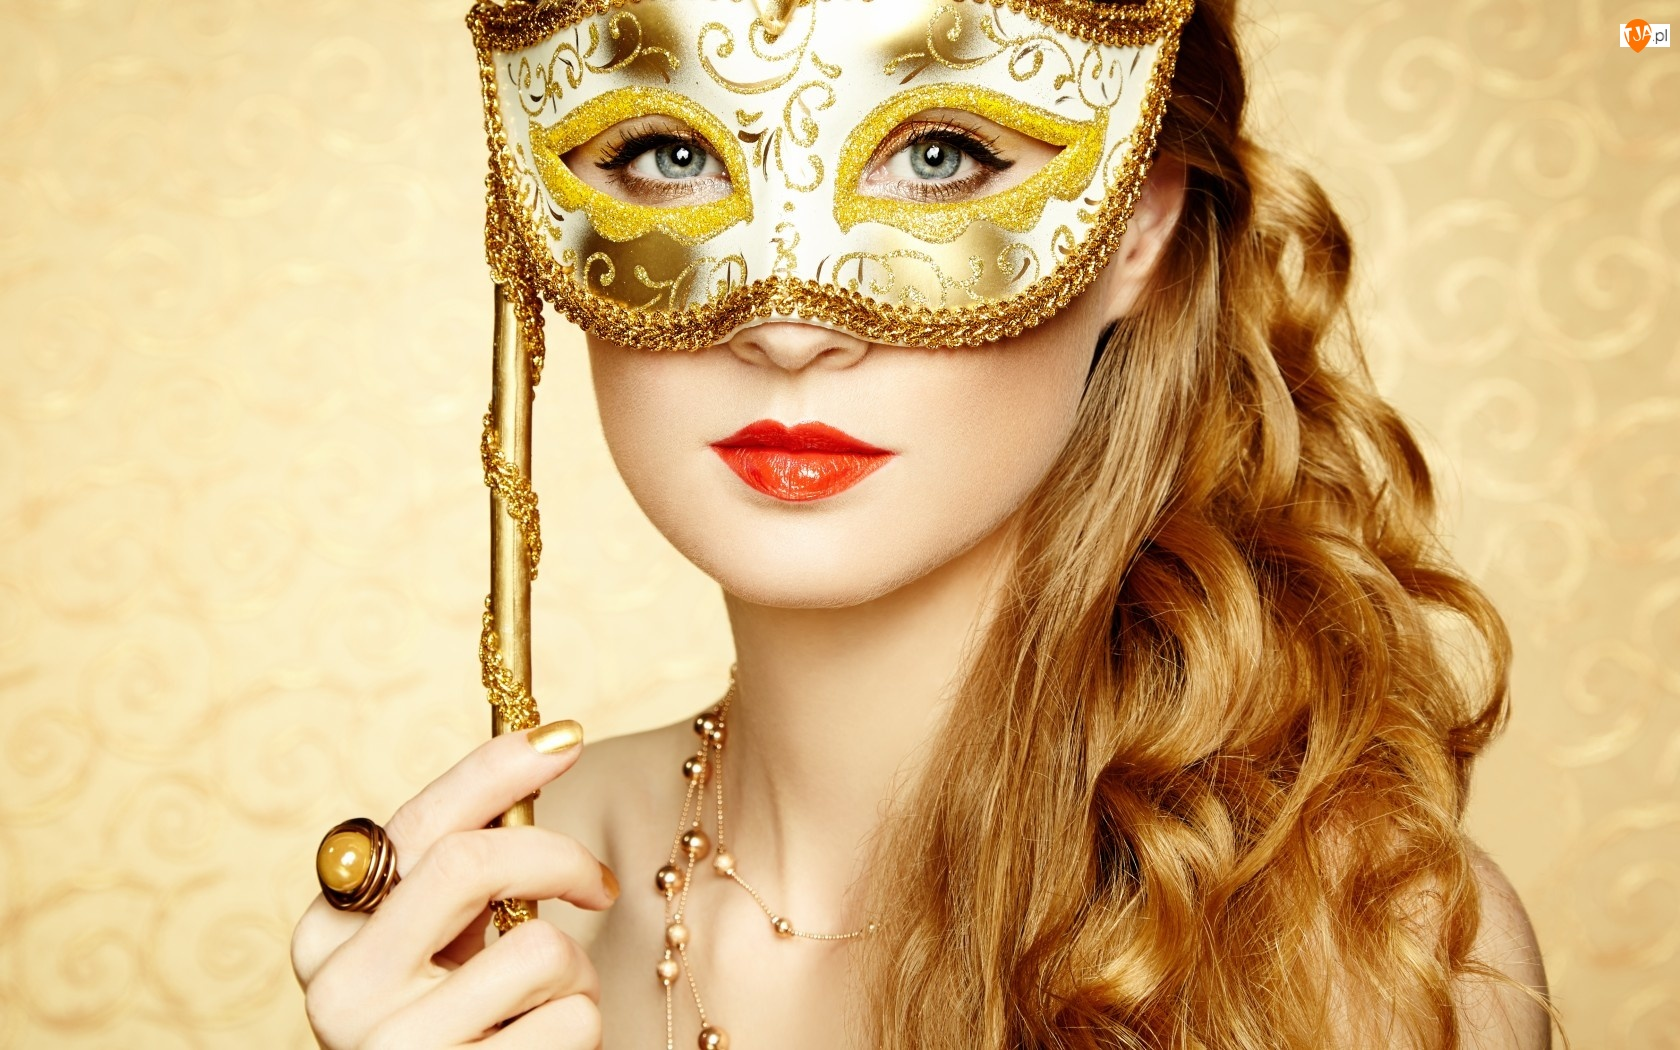 Biżuteria, Kobieta, Maska, Spojrzenie, Makijaż